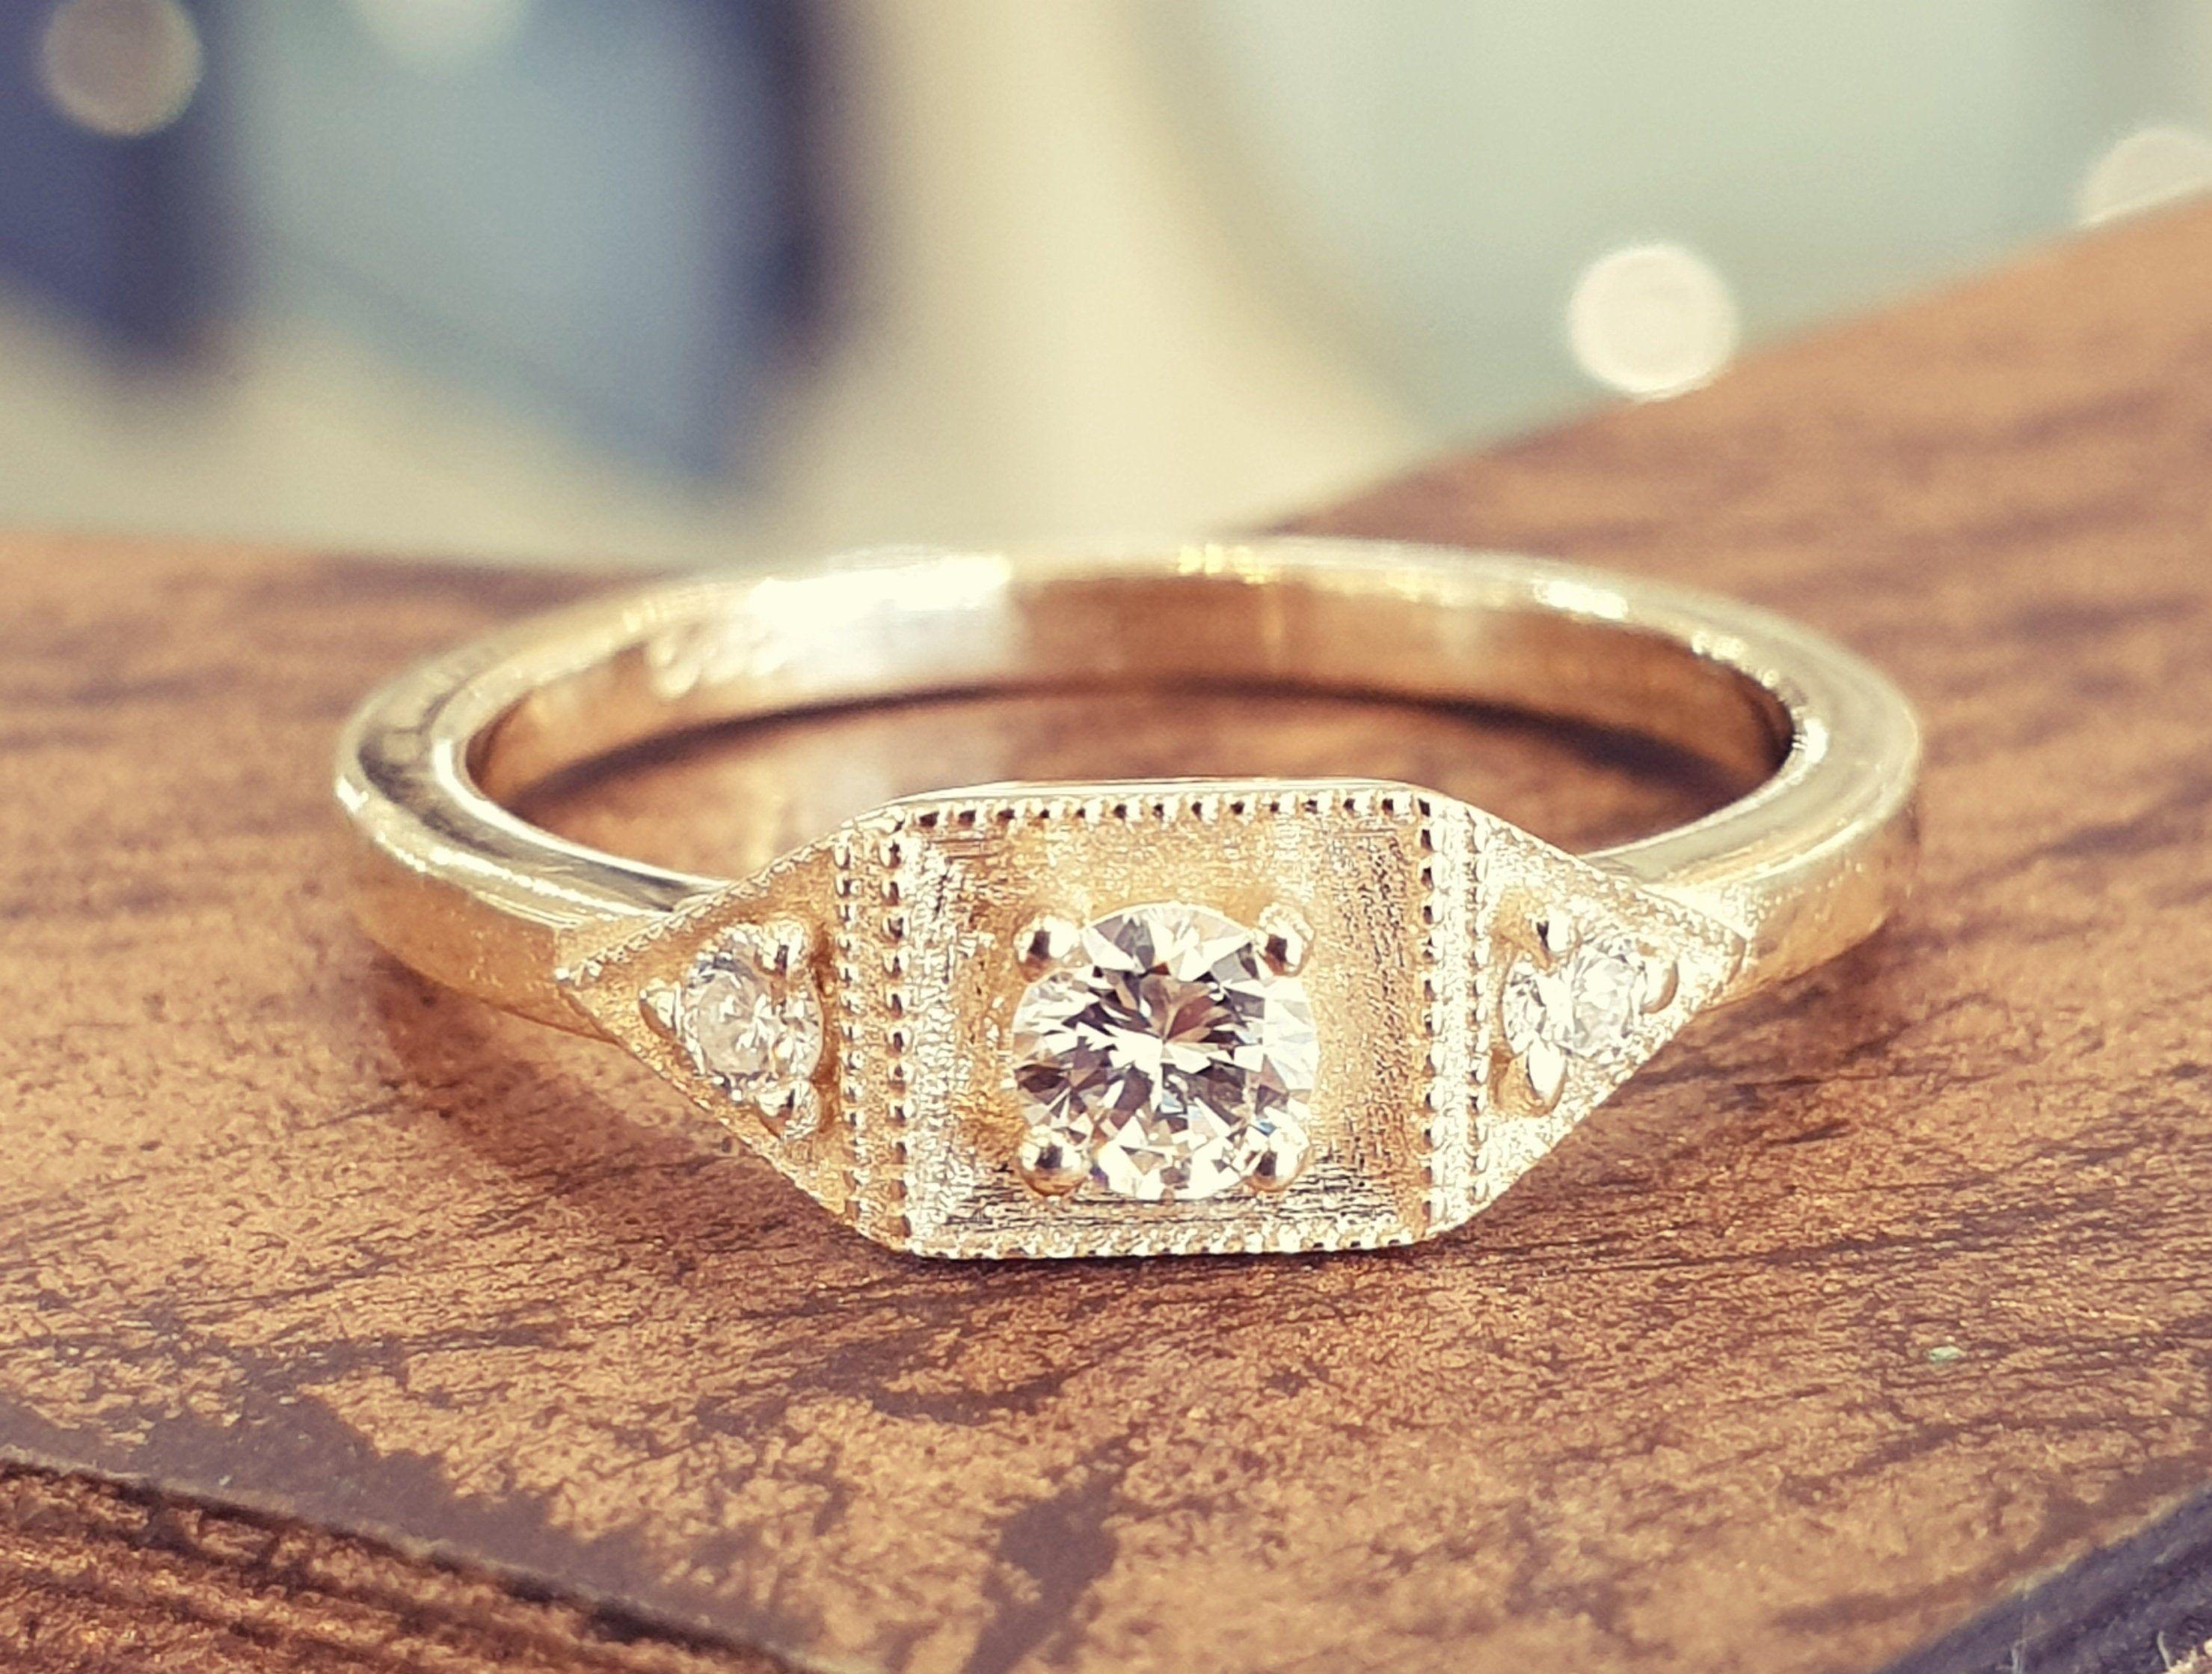 Antique Engagement Ring Diamond Engagement Ring 14k Yellow Gold